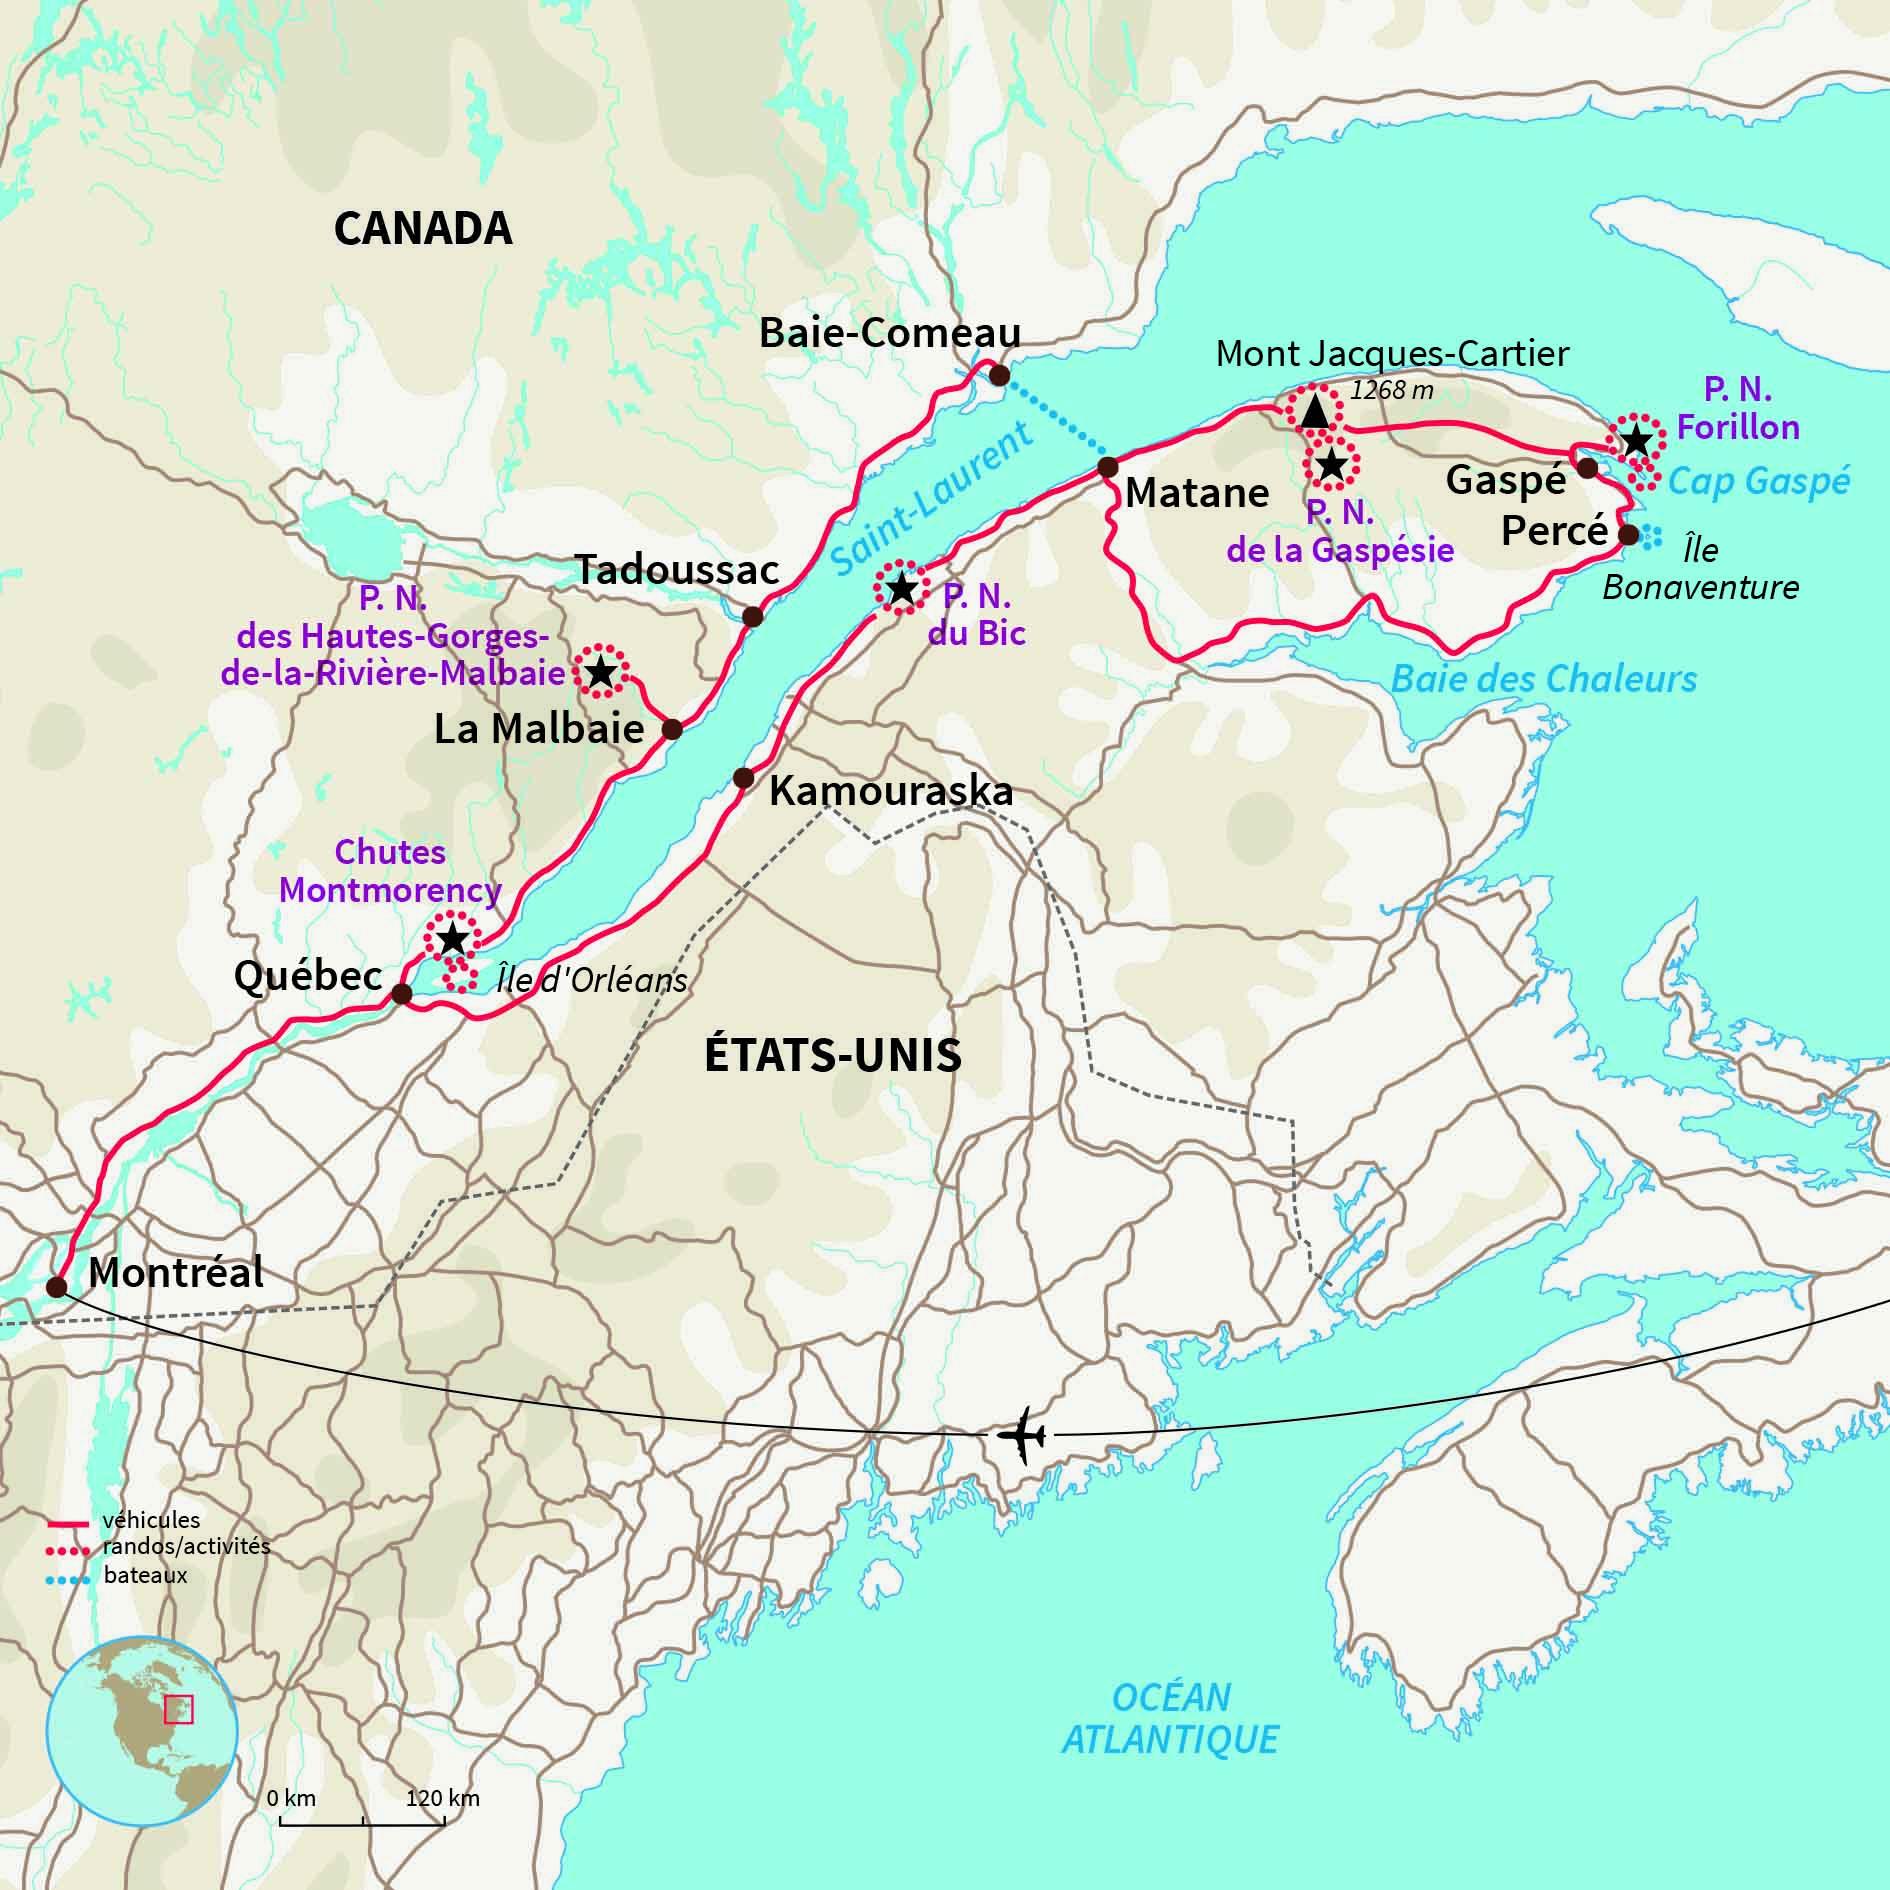 Carte Canada Gaspesie.Voyage Autotour Gaspesie Bienvenue En Gaspesie Nomade